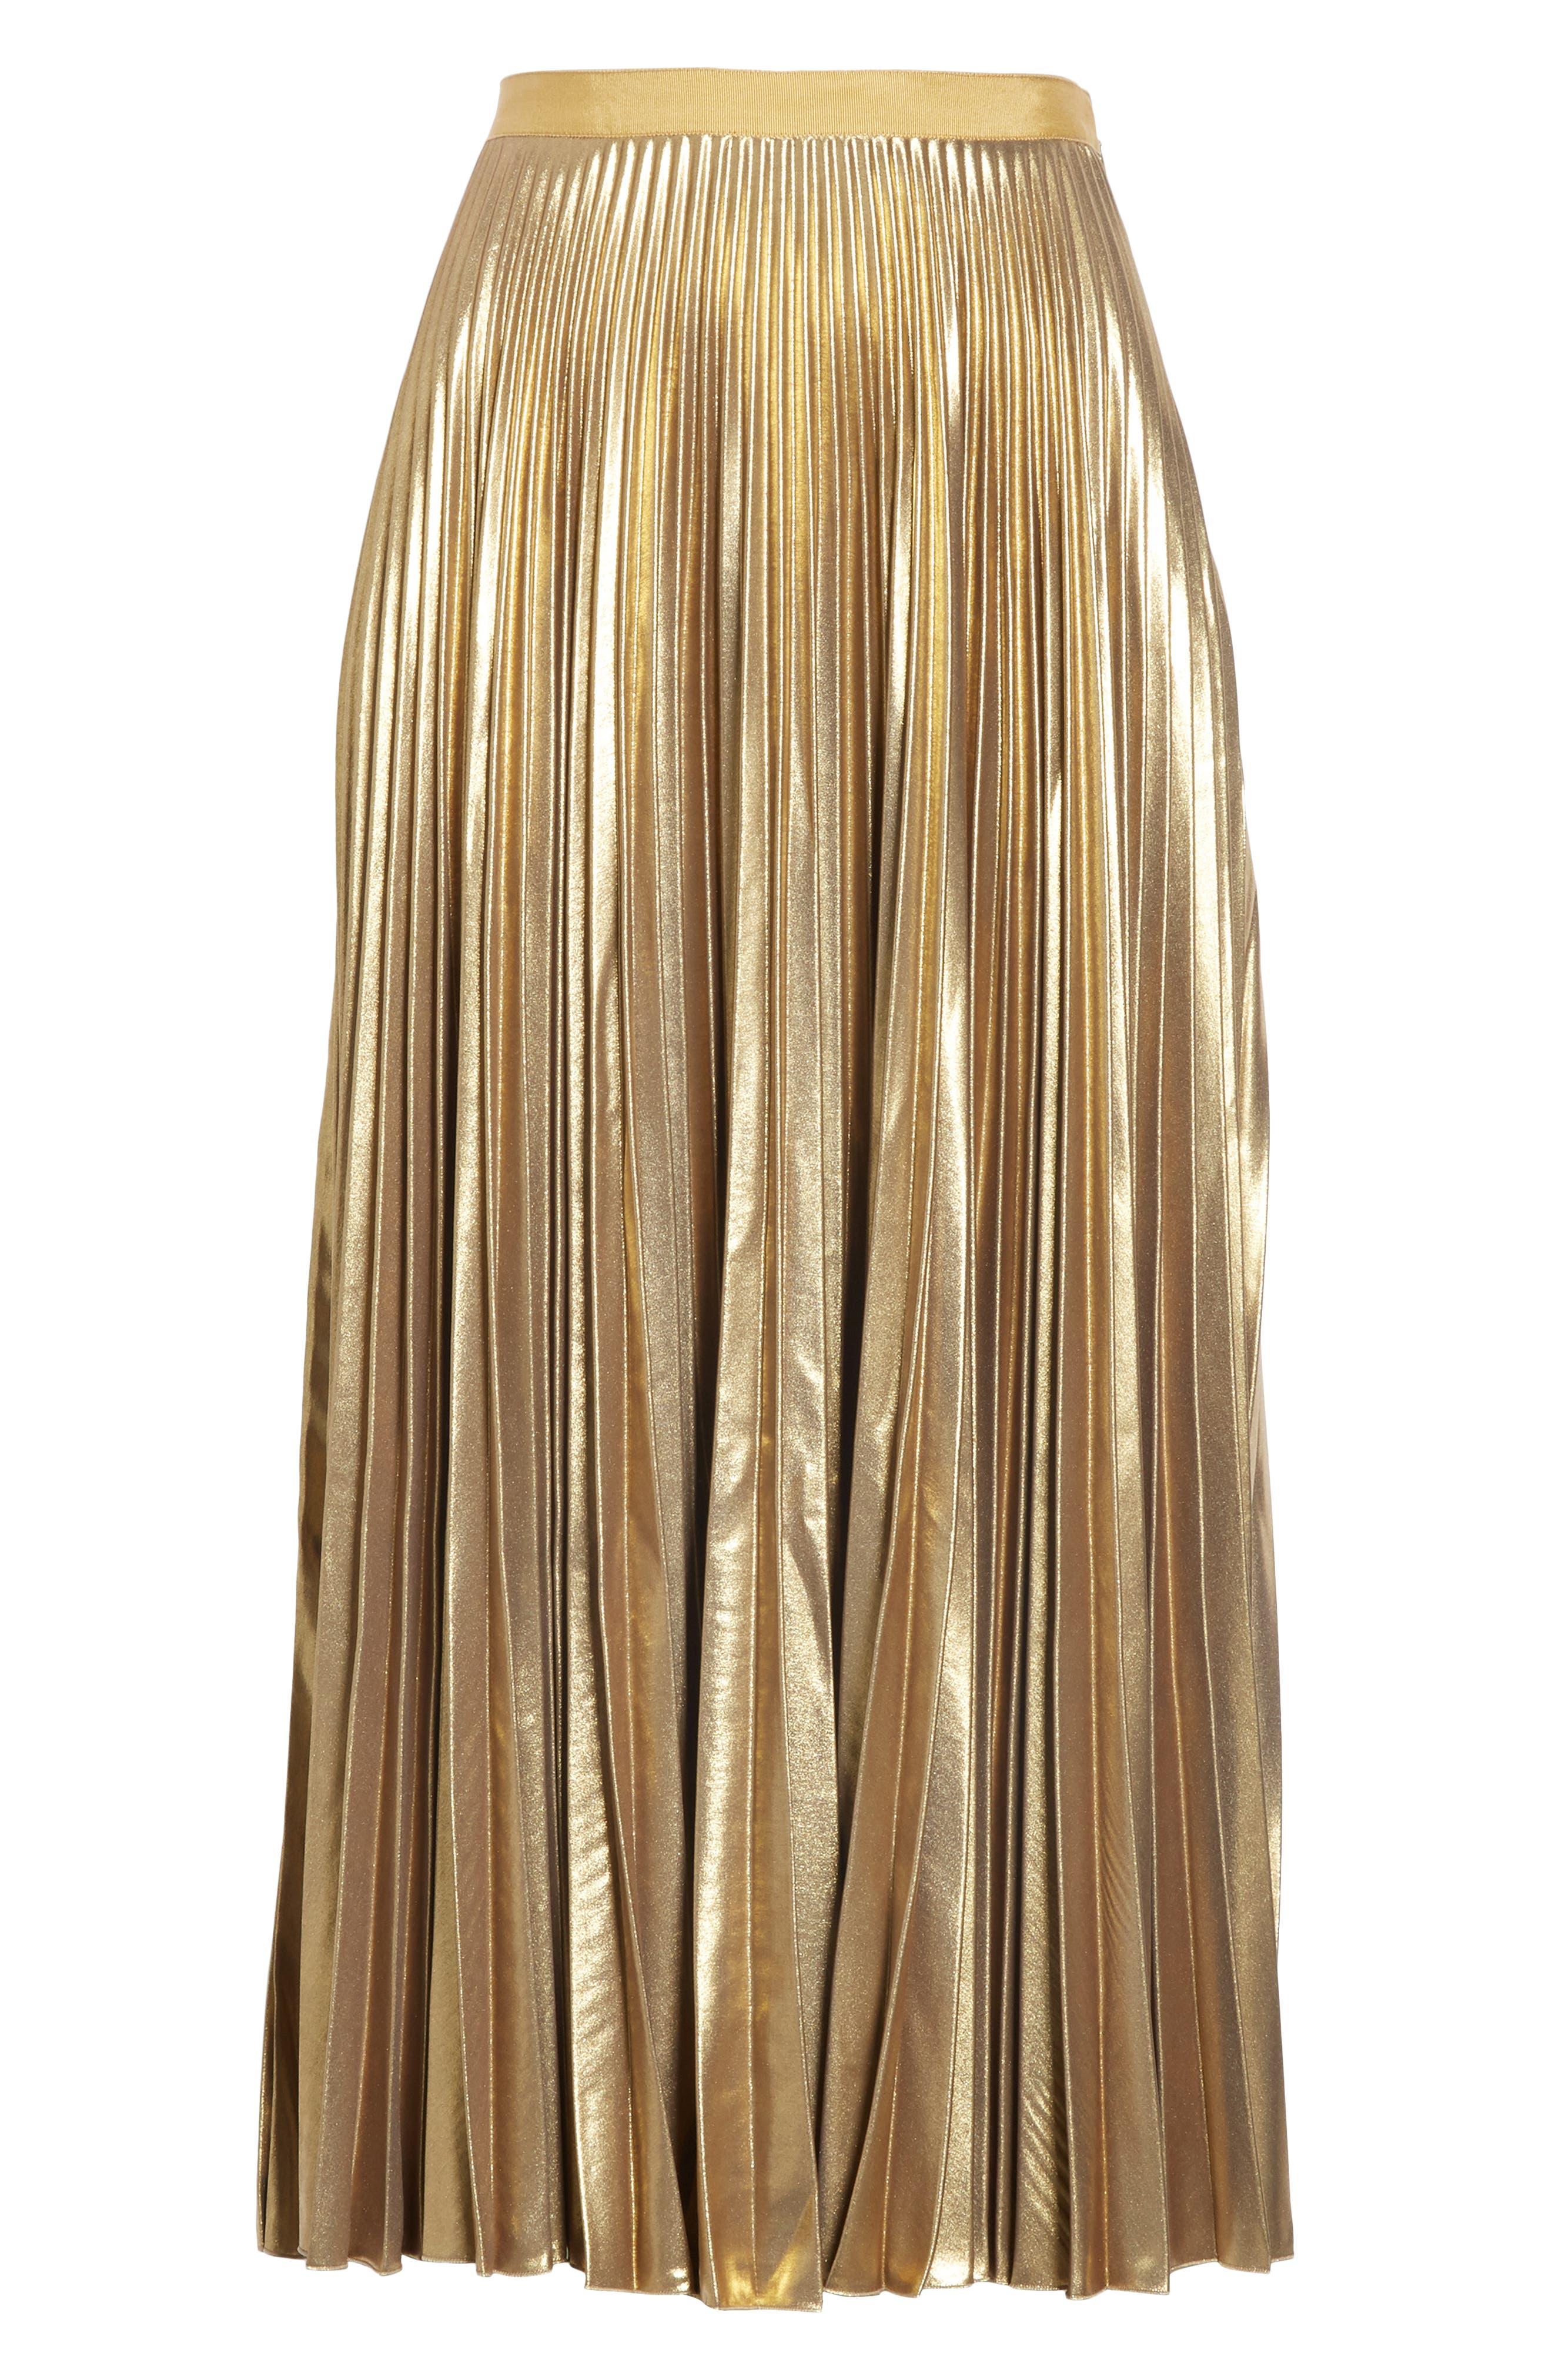 Pleated Metallic Skirt,                             Alternate thumbnail 6, color,                             710